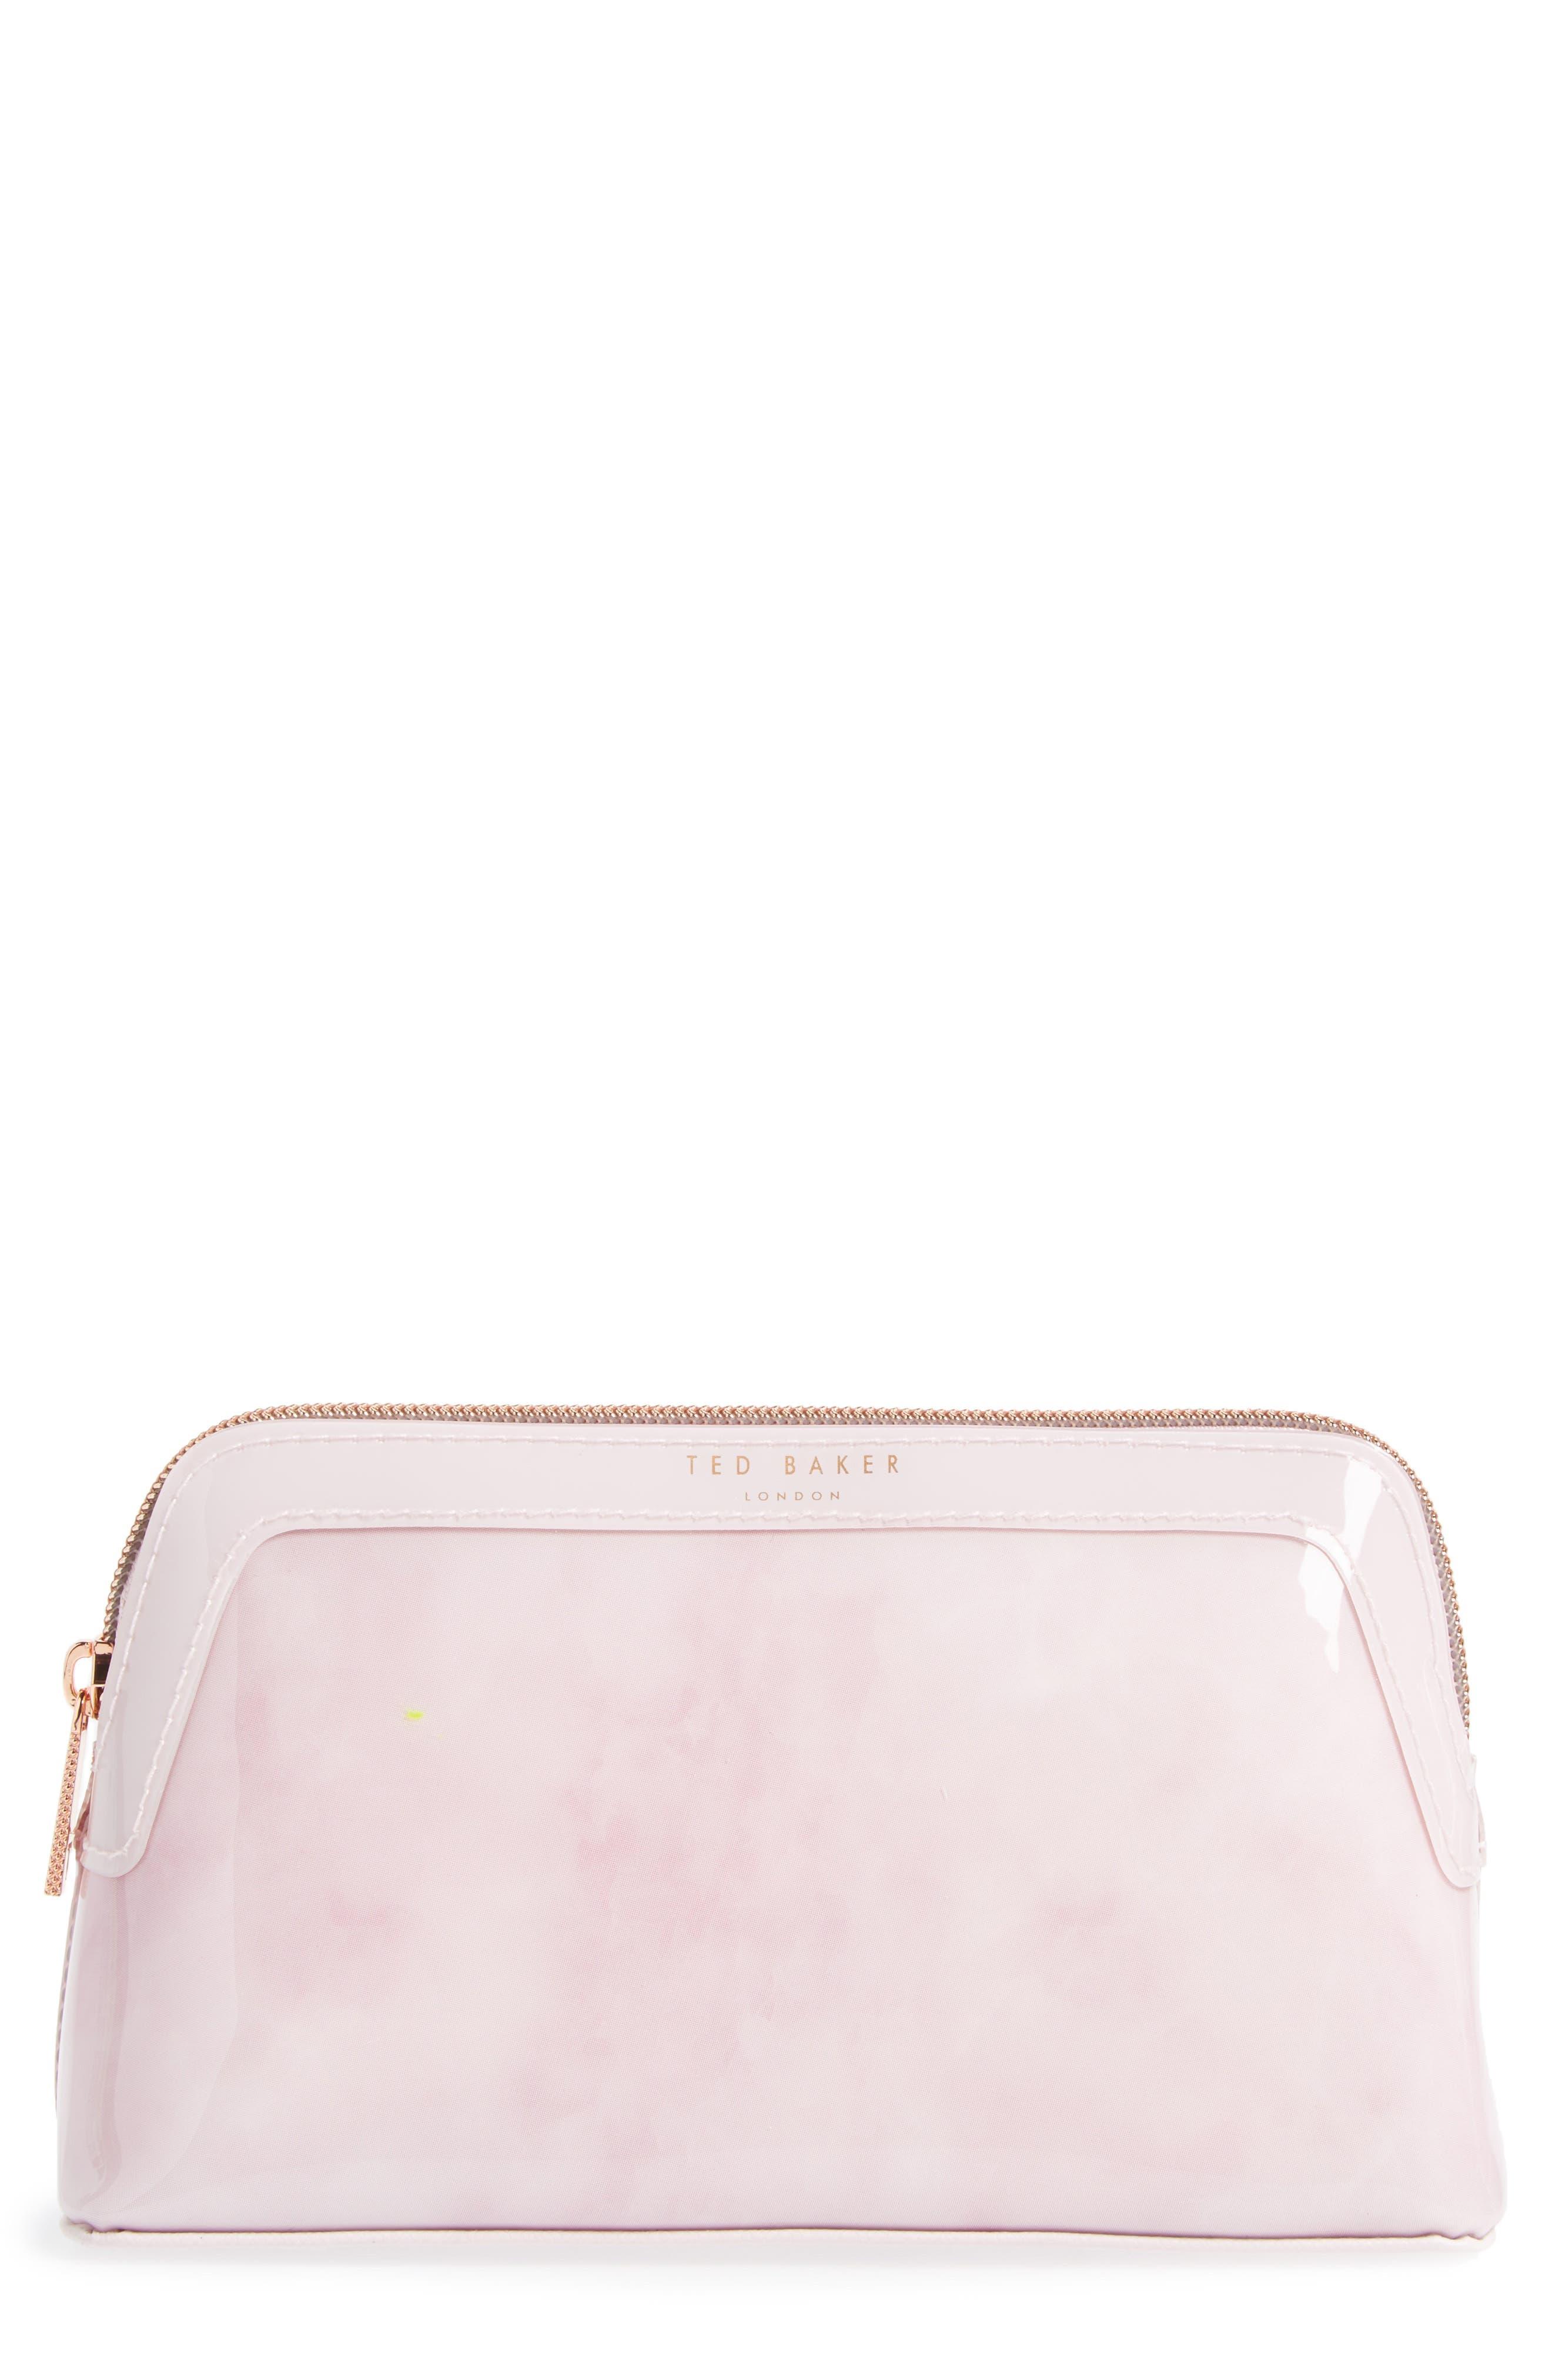 Main Image - Ted Baker London Zandra - Rose Quartz Cosmetics Bag